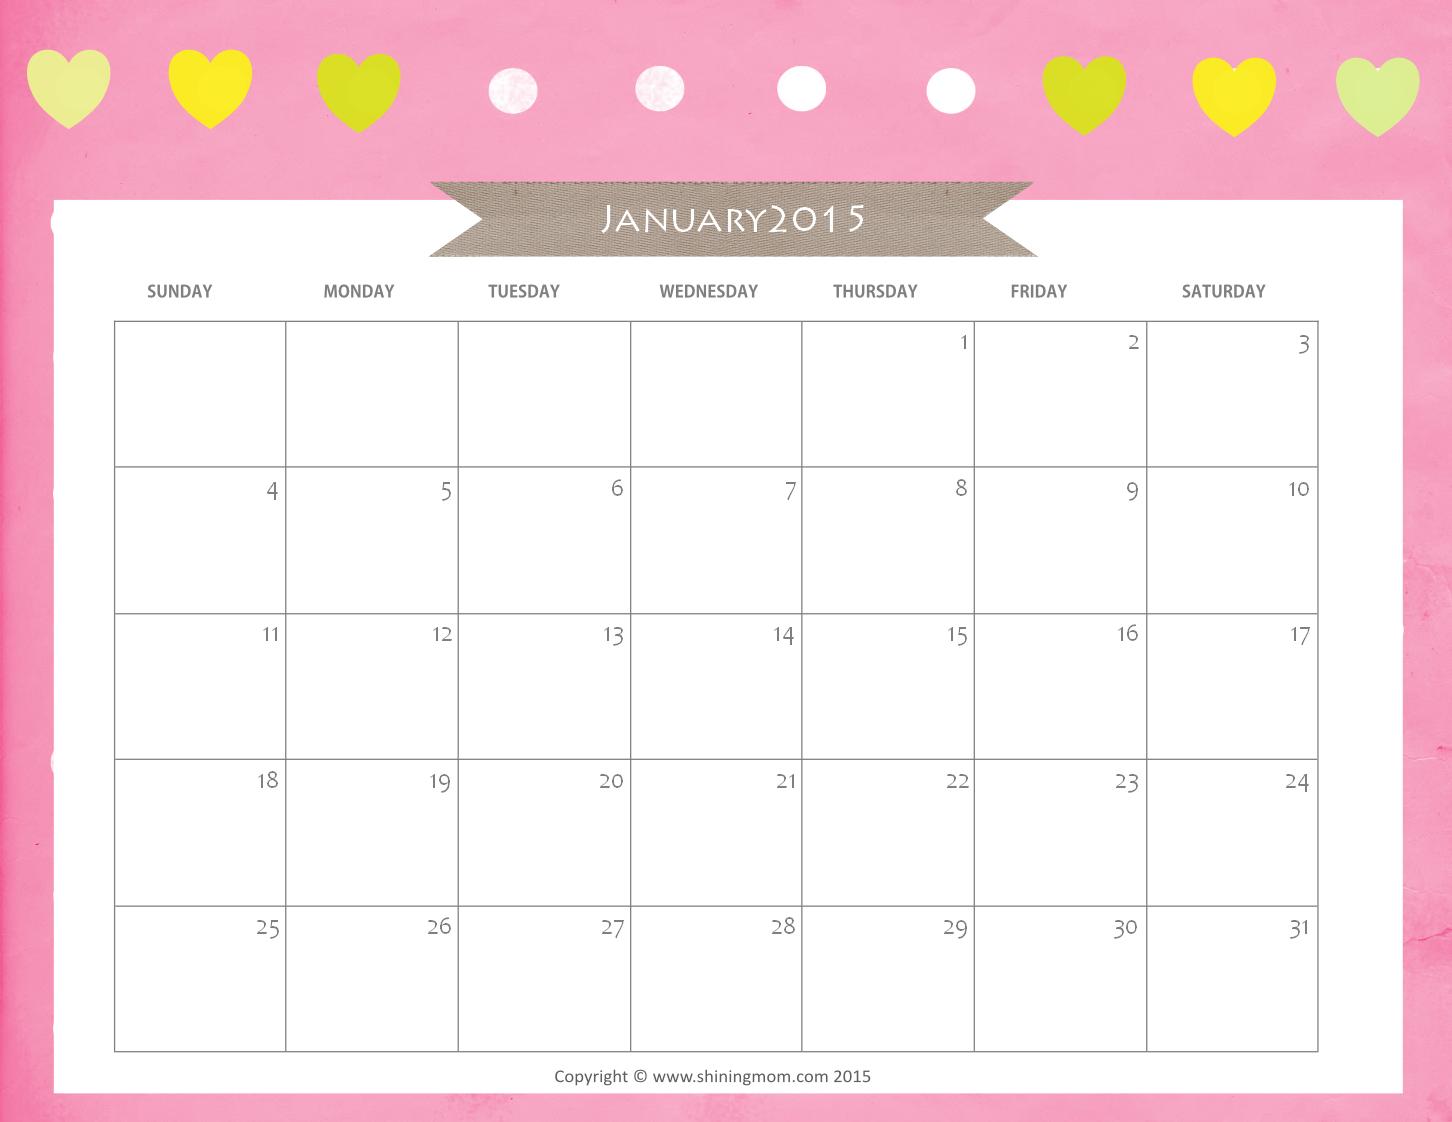 February 2015 calendar clipart jpg black and white Cute november calendar clipart 2015 - ClipartFest jpg black and white